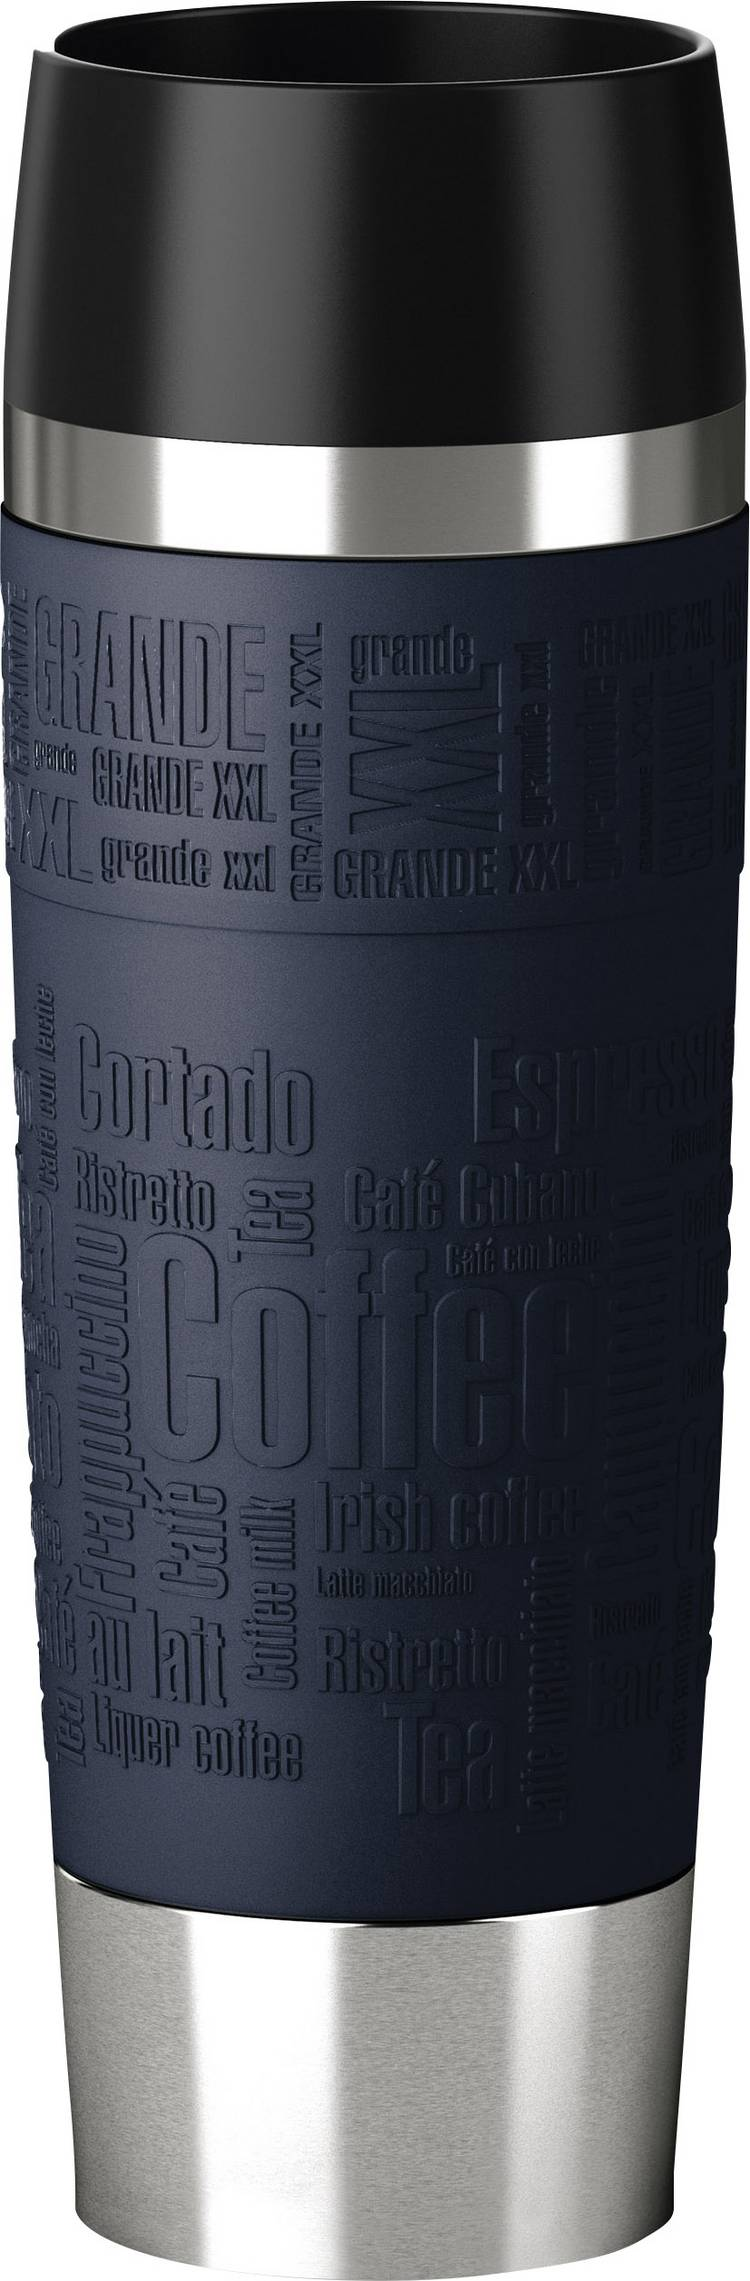 Image of Emsa-thermosbeker Travel Mug Grande, 0,5 liter, blauw